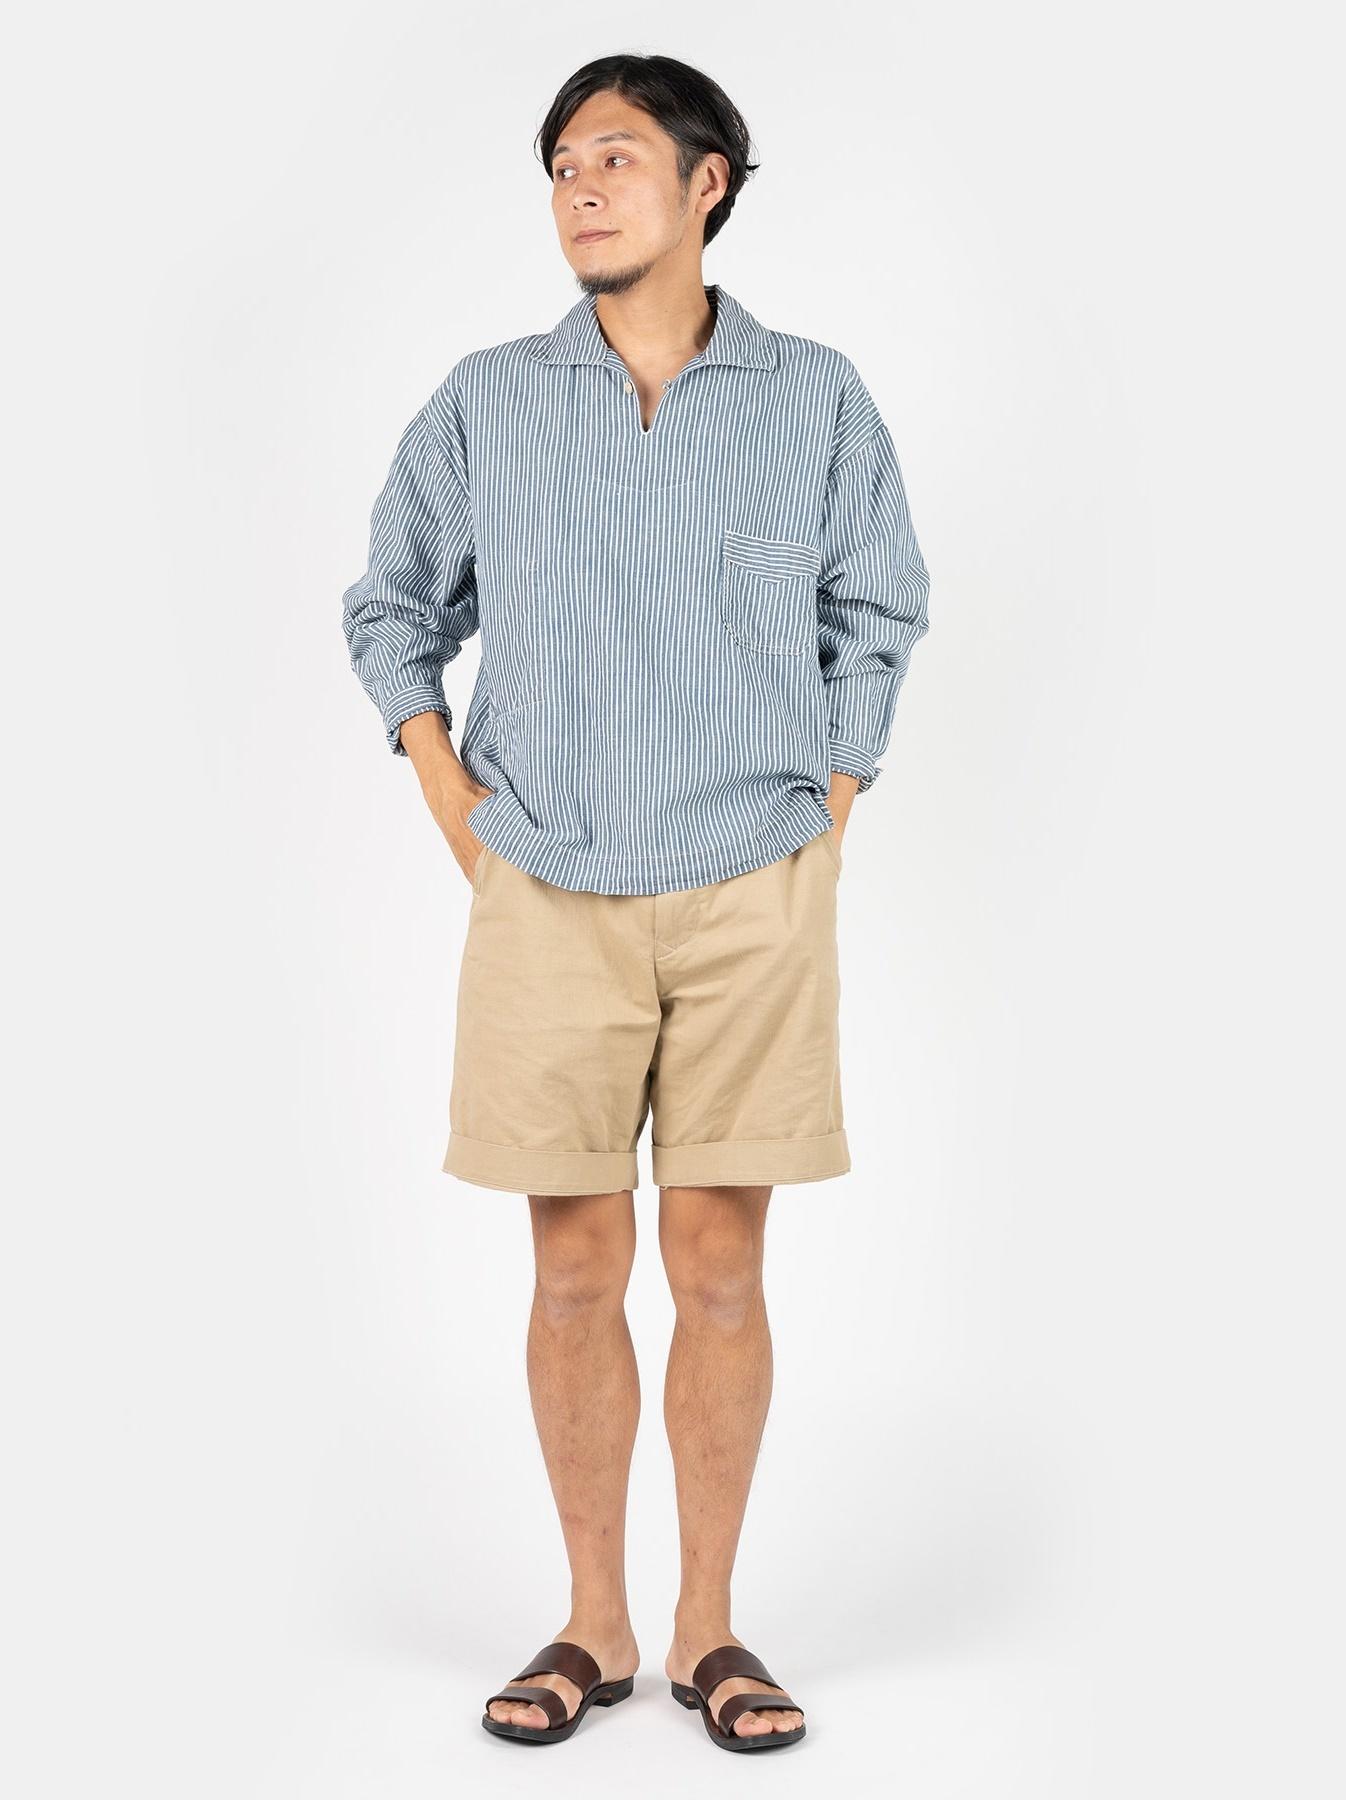 WH Cotton Linen Hickory Umahiko Pullover Shirt-2